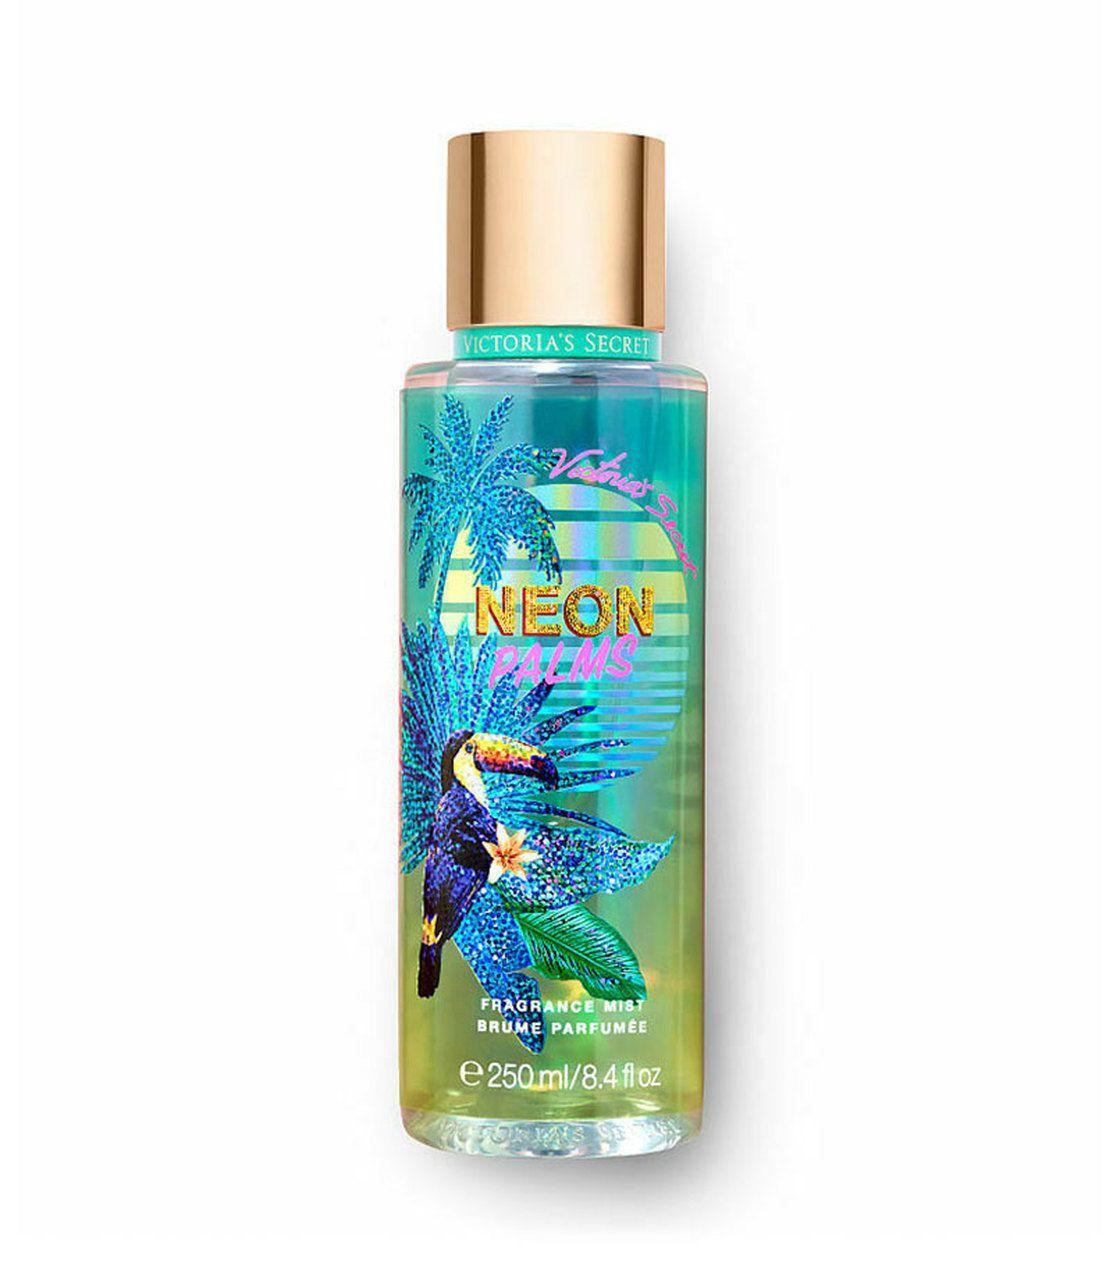 Victoria S Secret Neon Palms Body Mist 8 4 Oz Fragrance Mist Victoria Secret Fragrances Victorias Secret Beauty